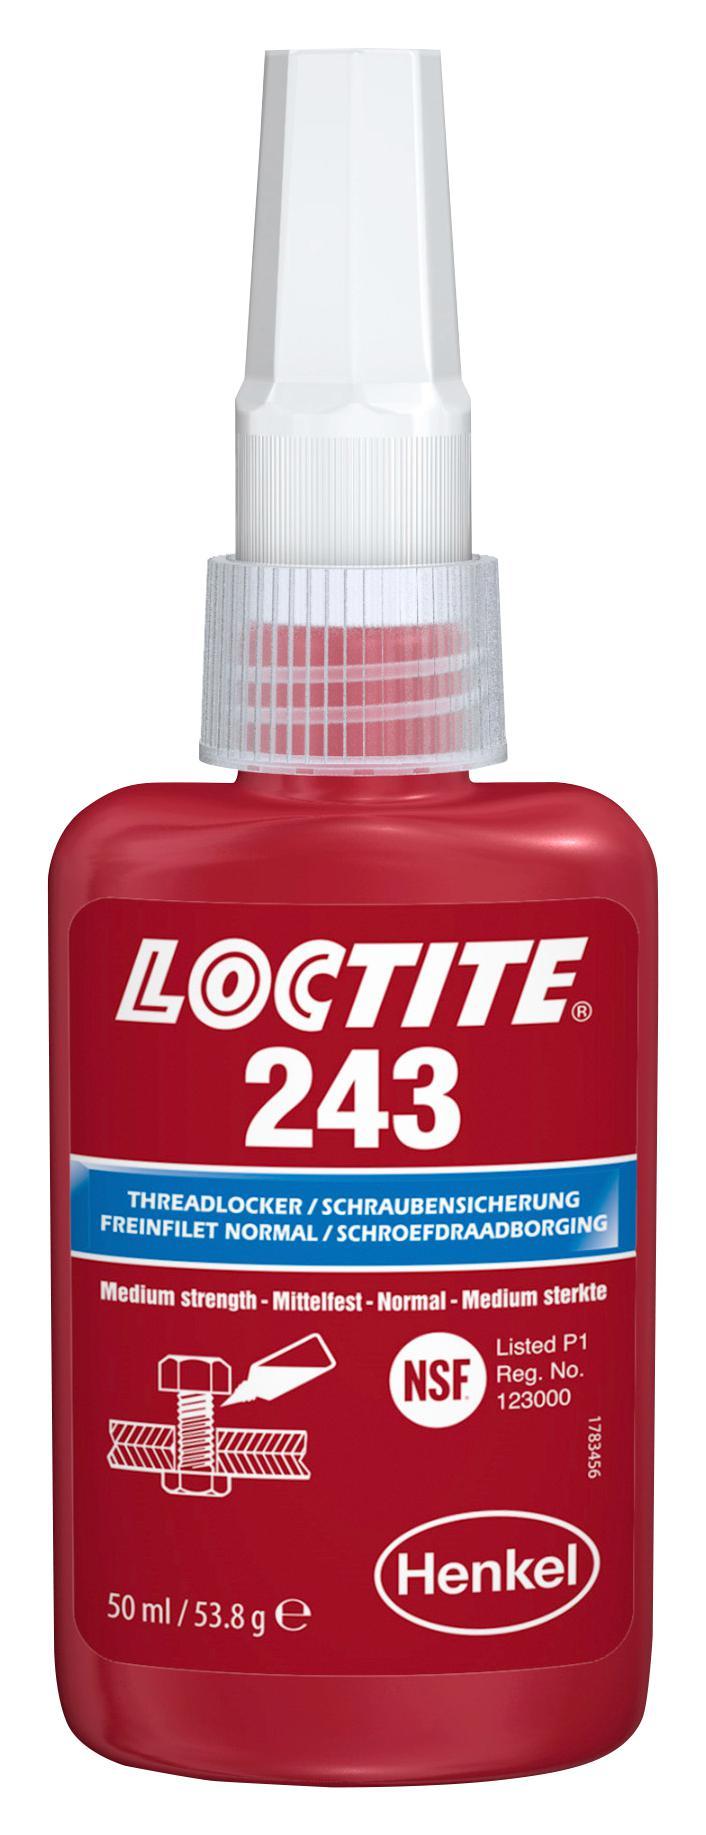 Loctite 243 50ml Schroefdraadborging